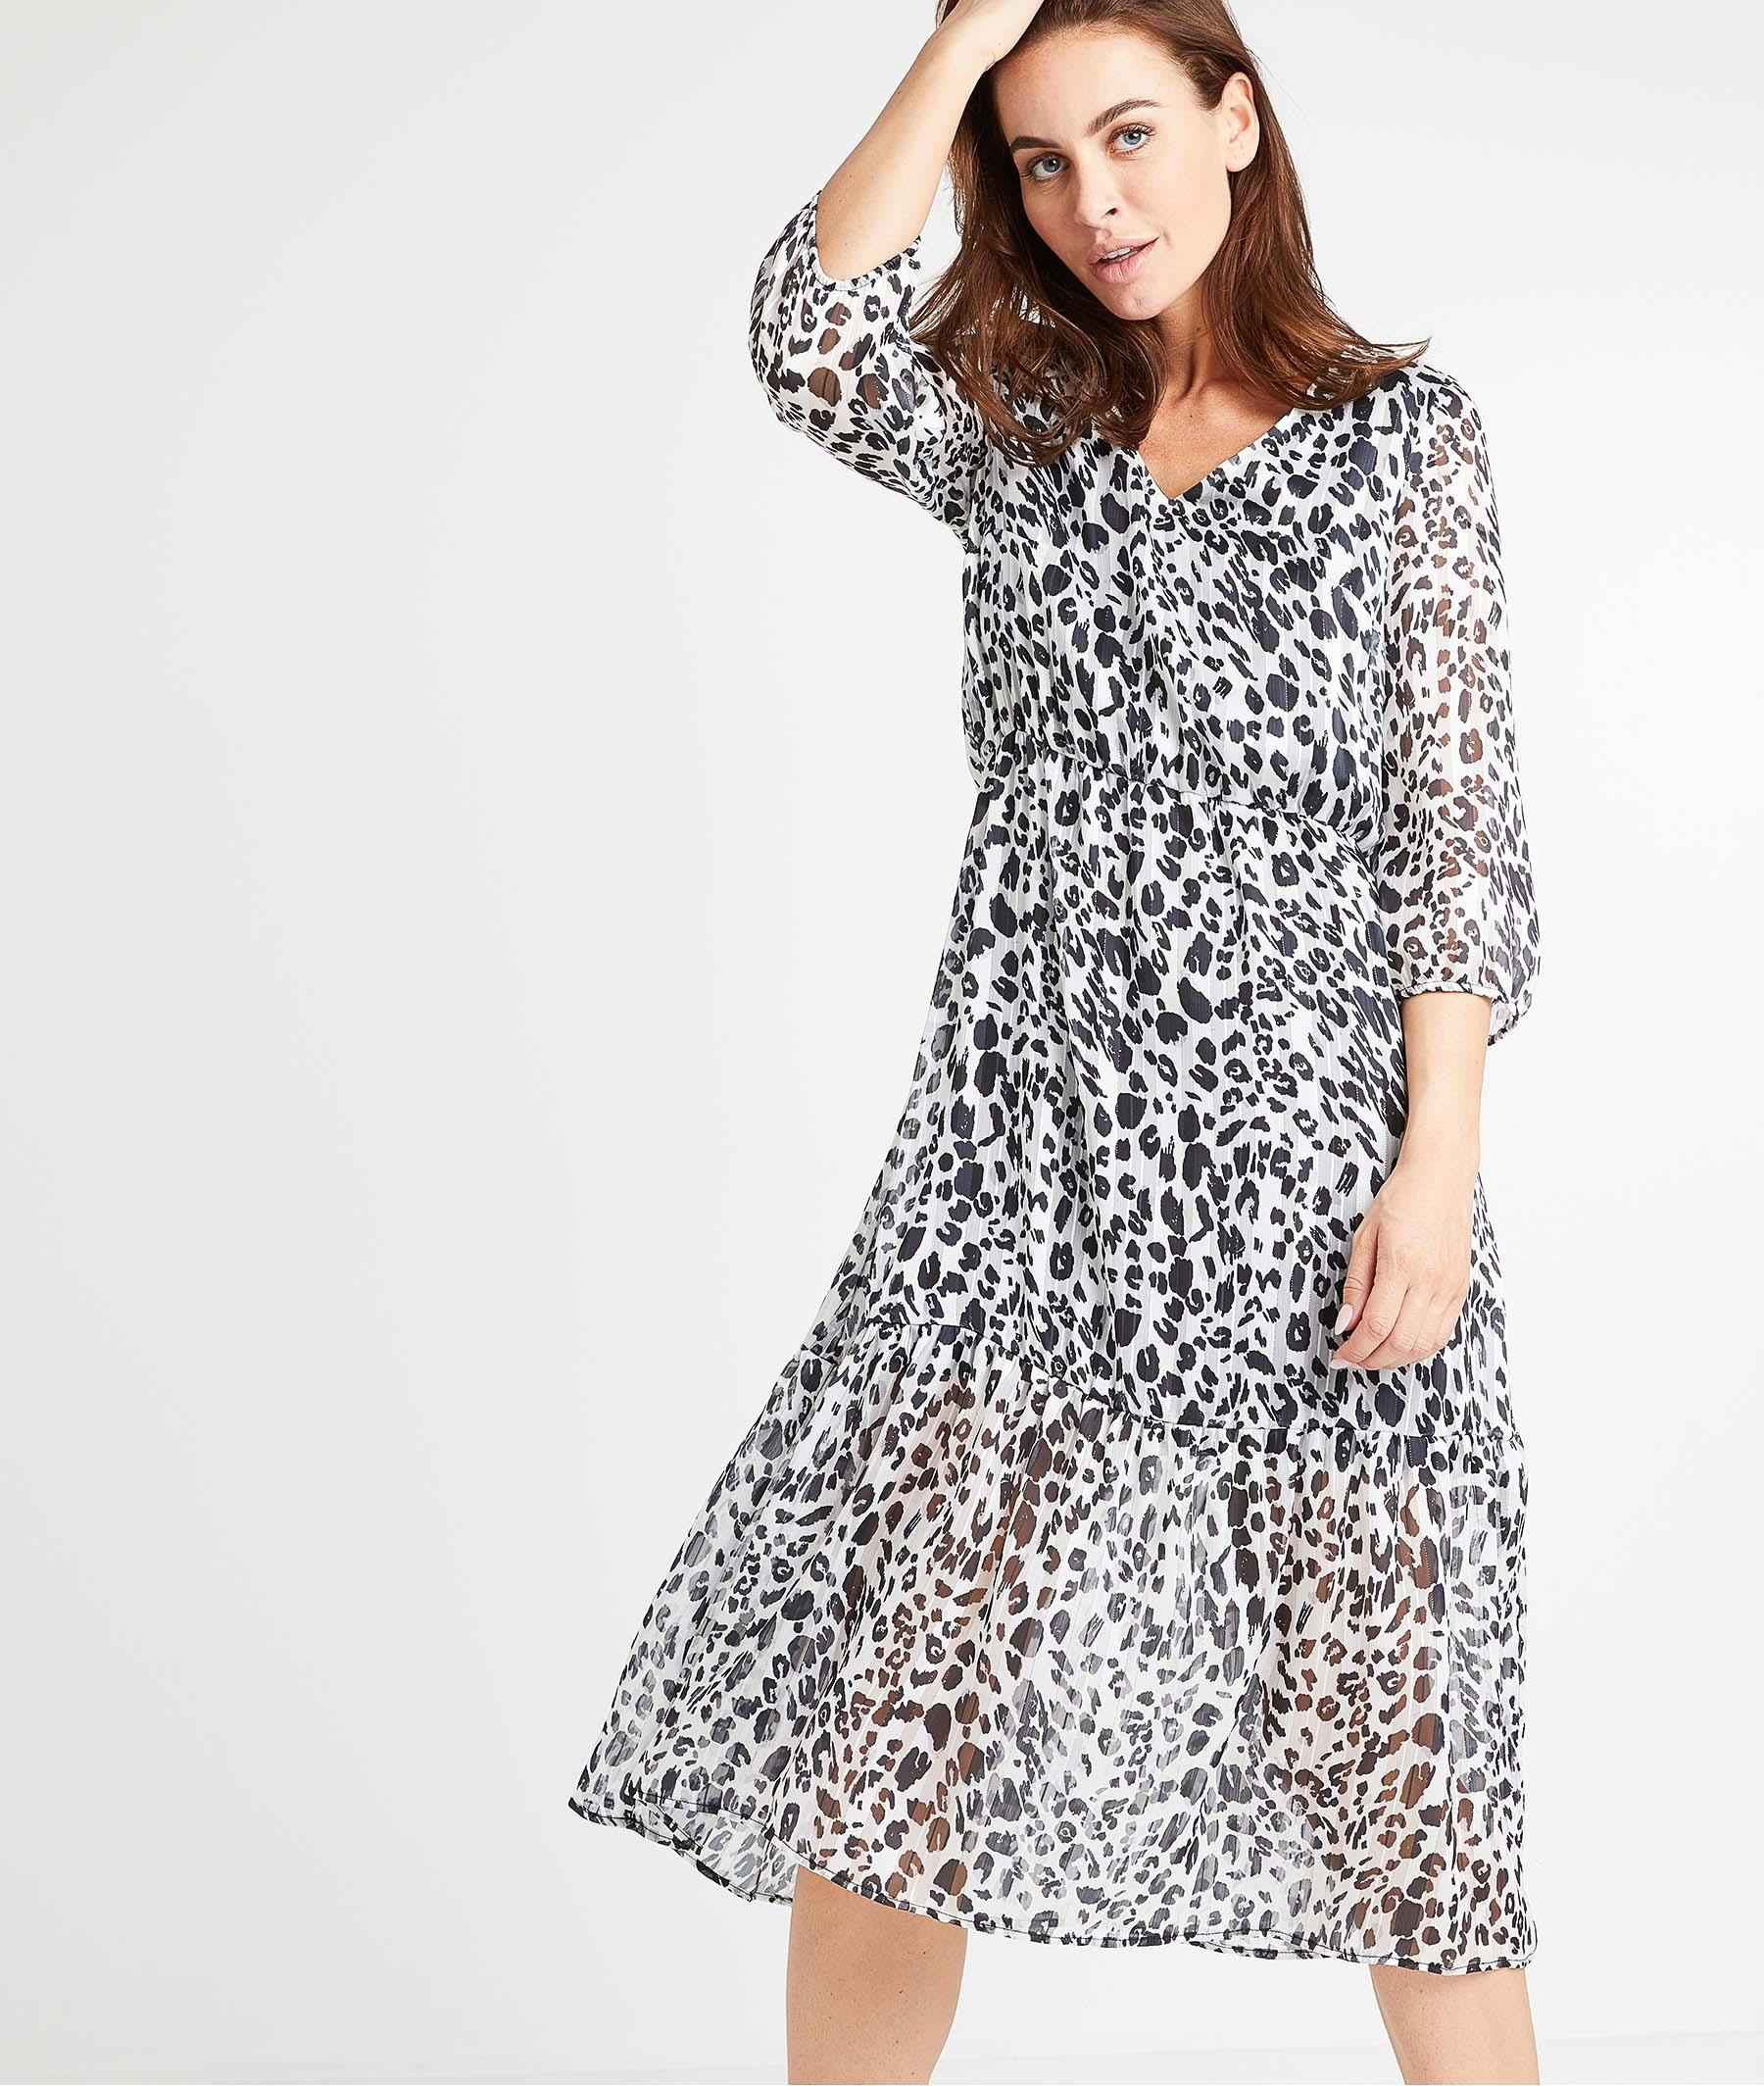 Robe mi-longue léopard femme NOIR